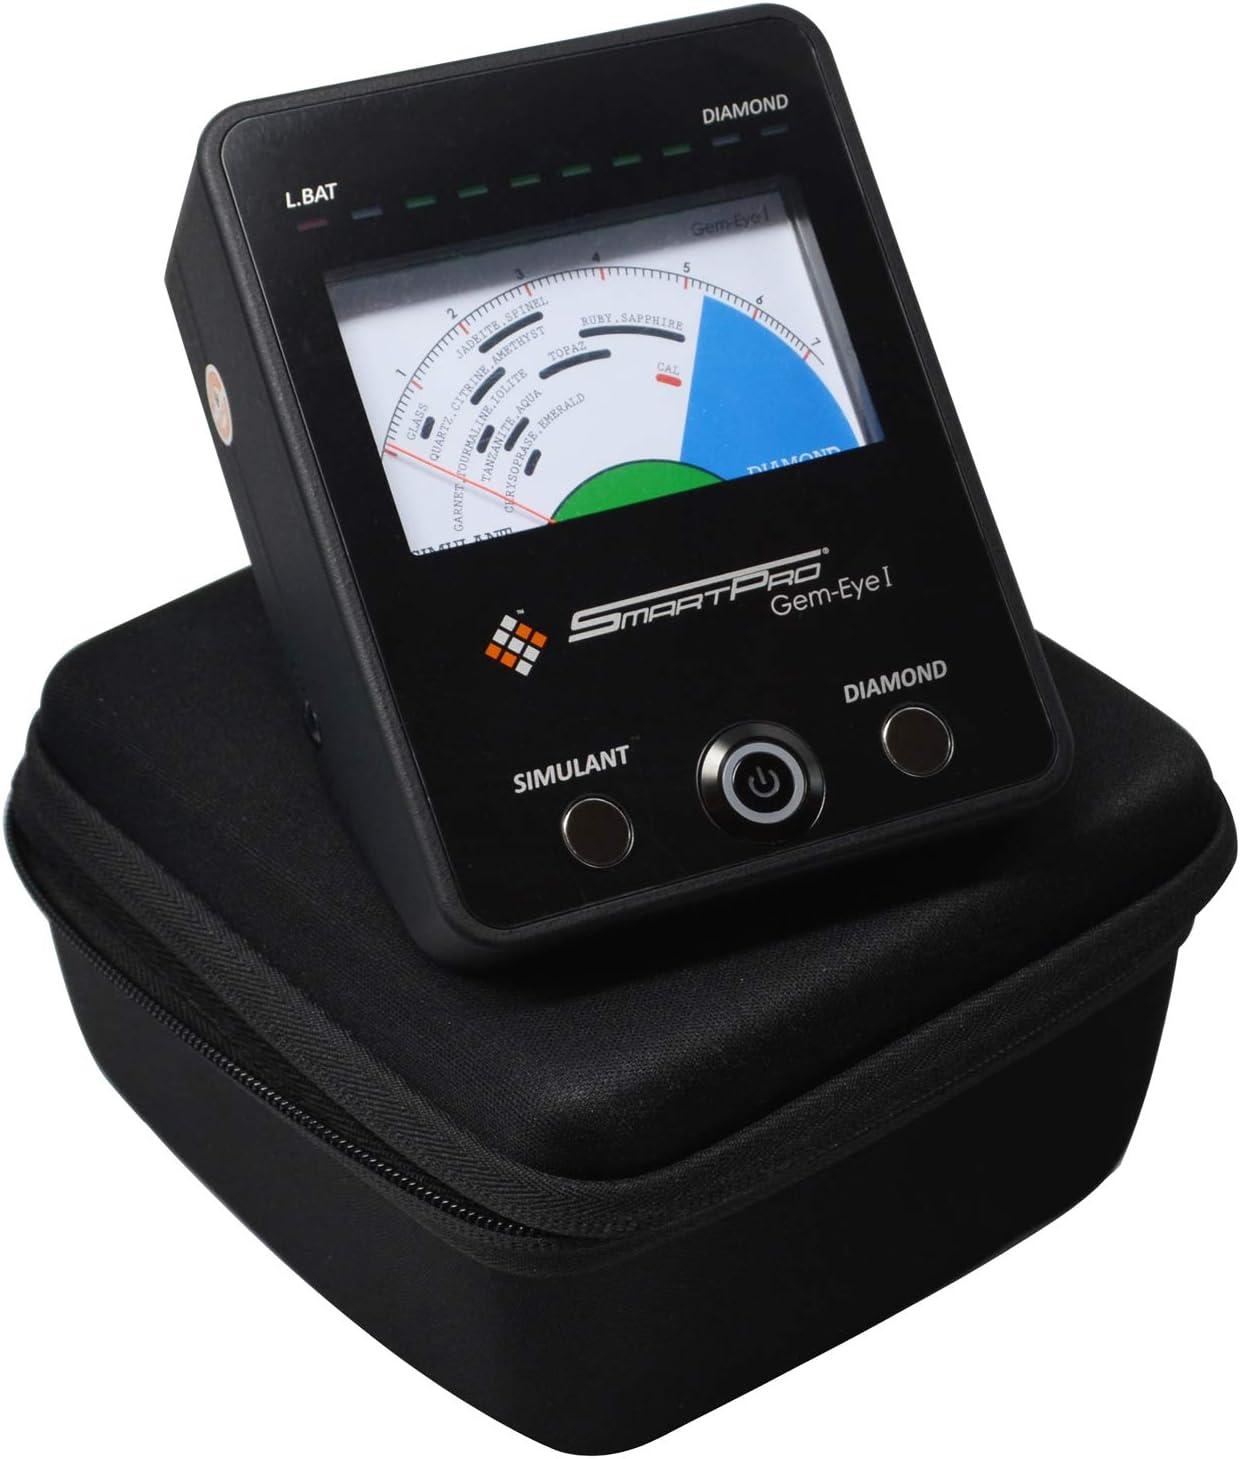 Simulant Electric Tester Inspection Tool Set SmartPro Gem-Eye I SPGE-1 Diamond Gemstone Vs